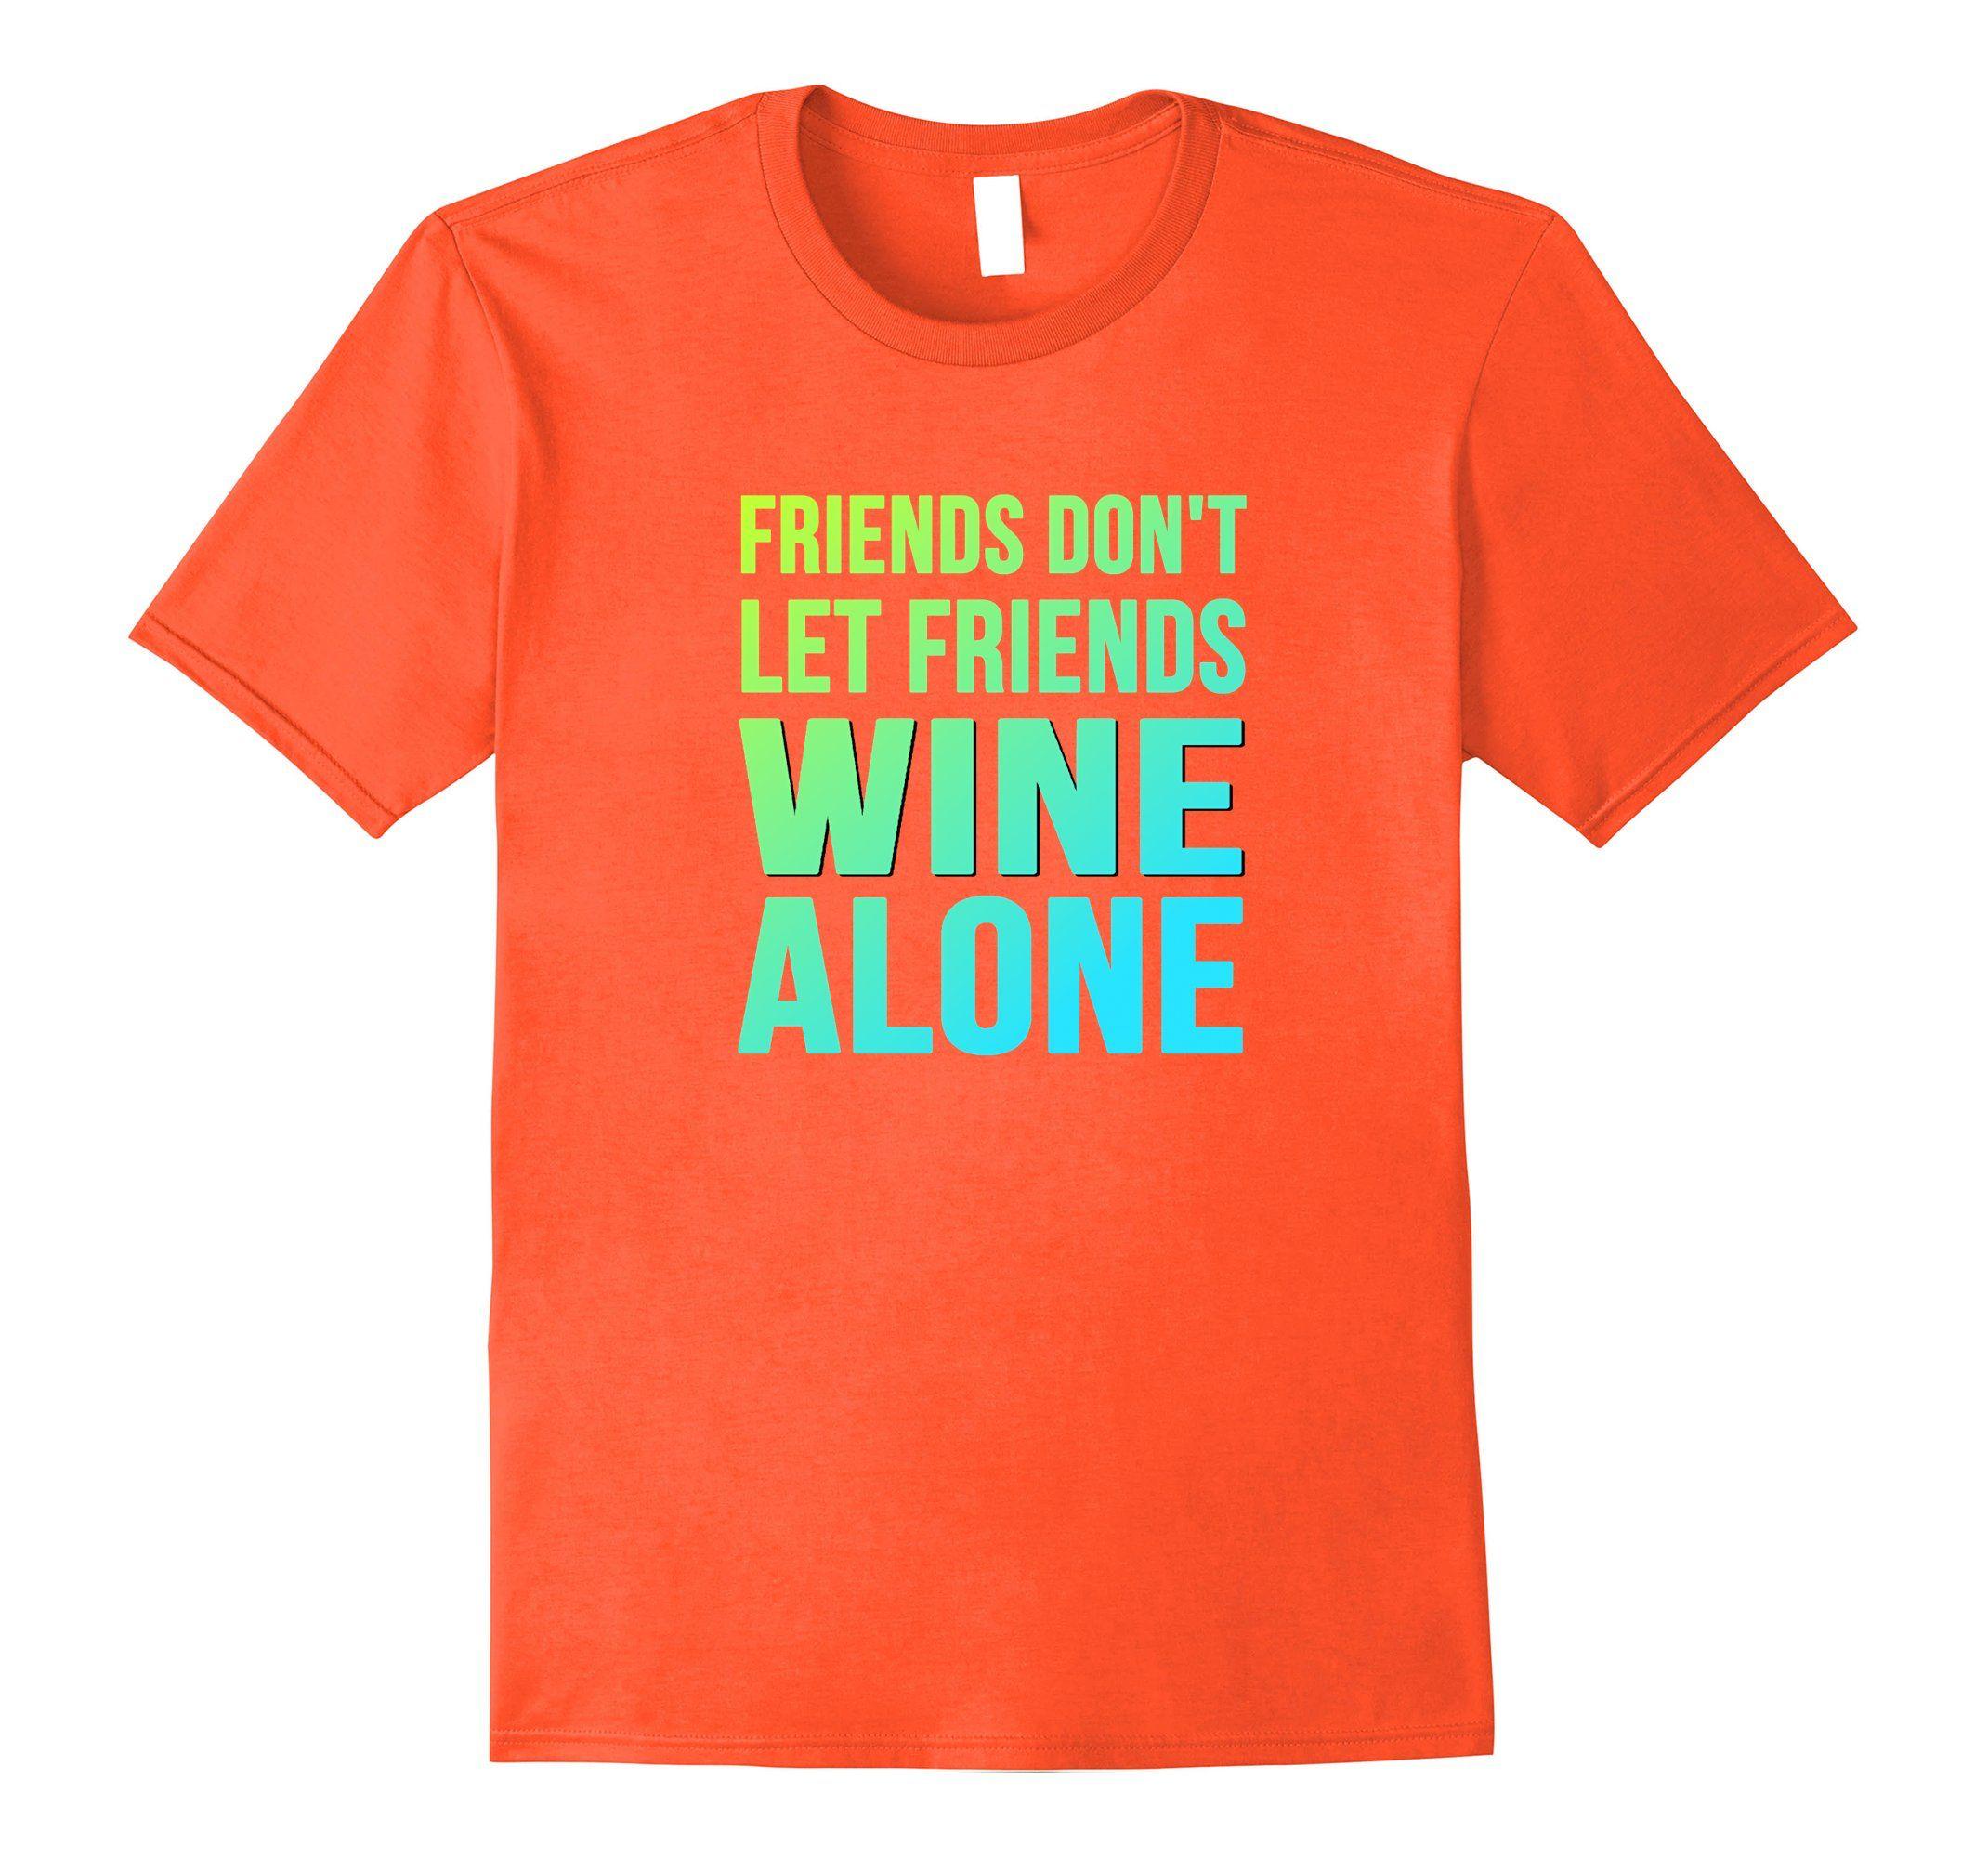 61cbfeb2 Amazon.com: Friends Dont Let Friends Wine Alone Trinidad Carnival Shirts:  Clothing